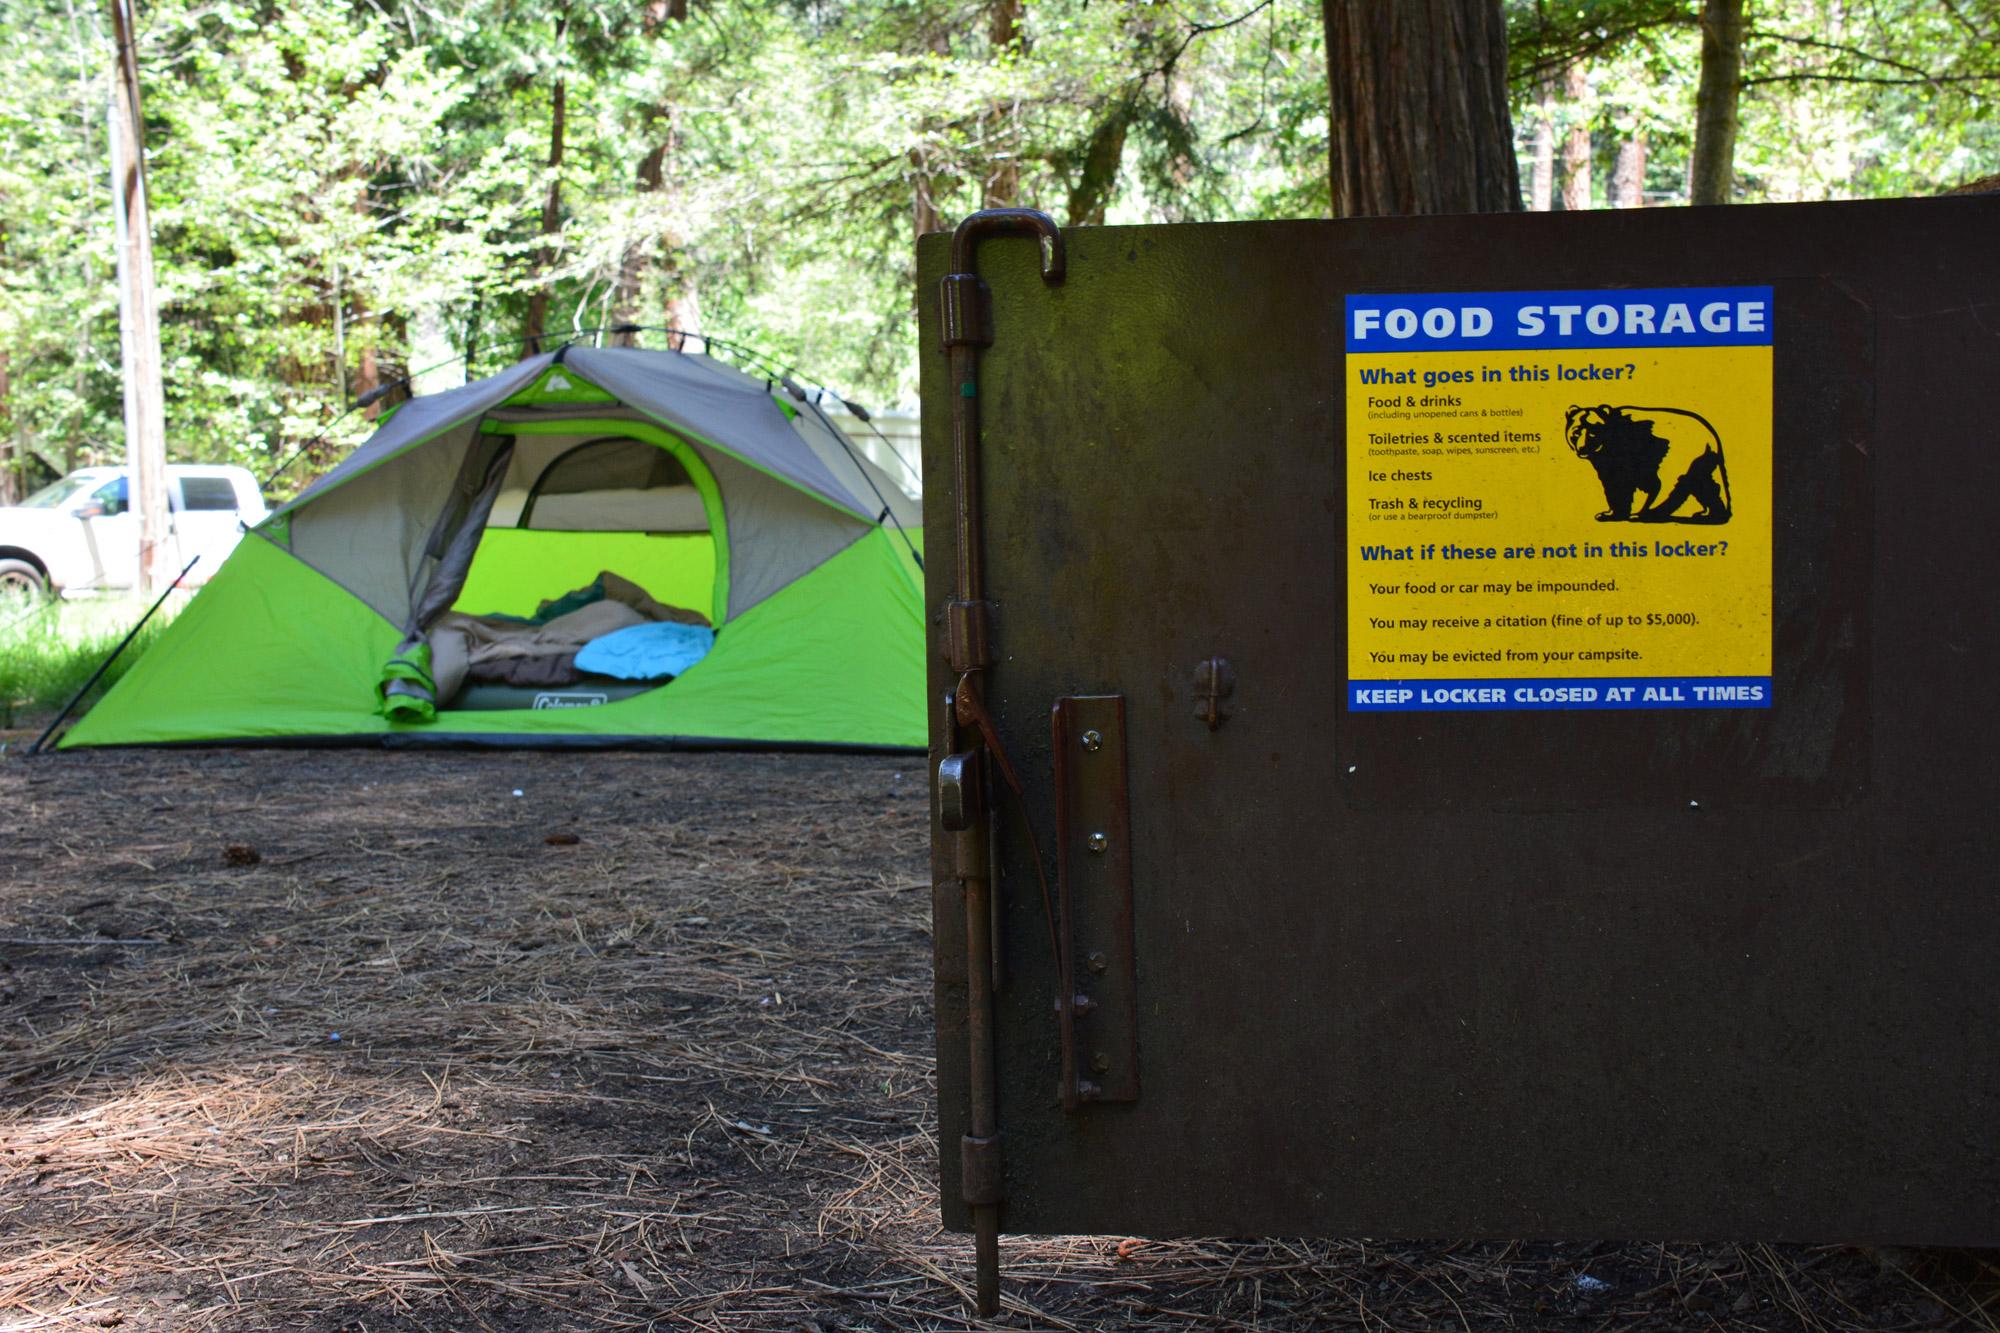 Ivonne - Wildkamperen, Verenigde Staten